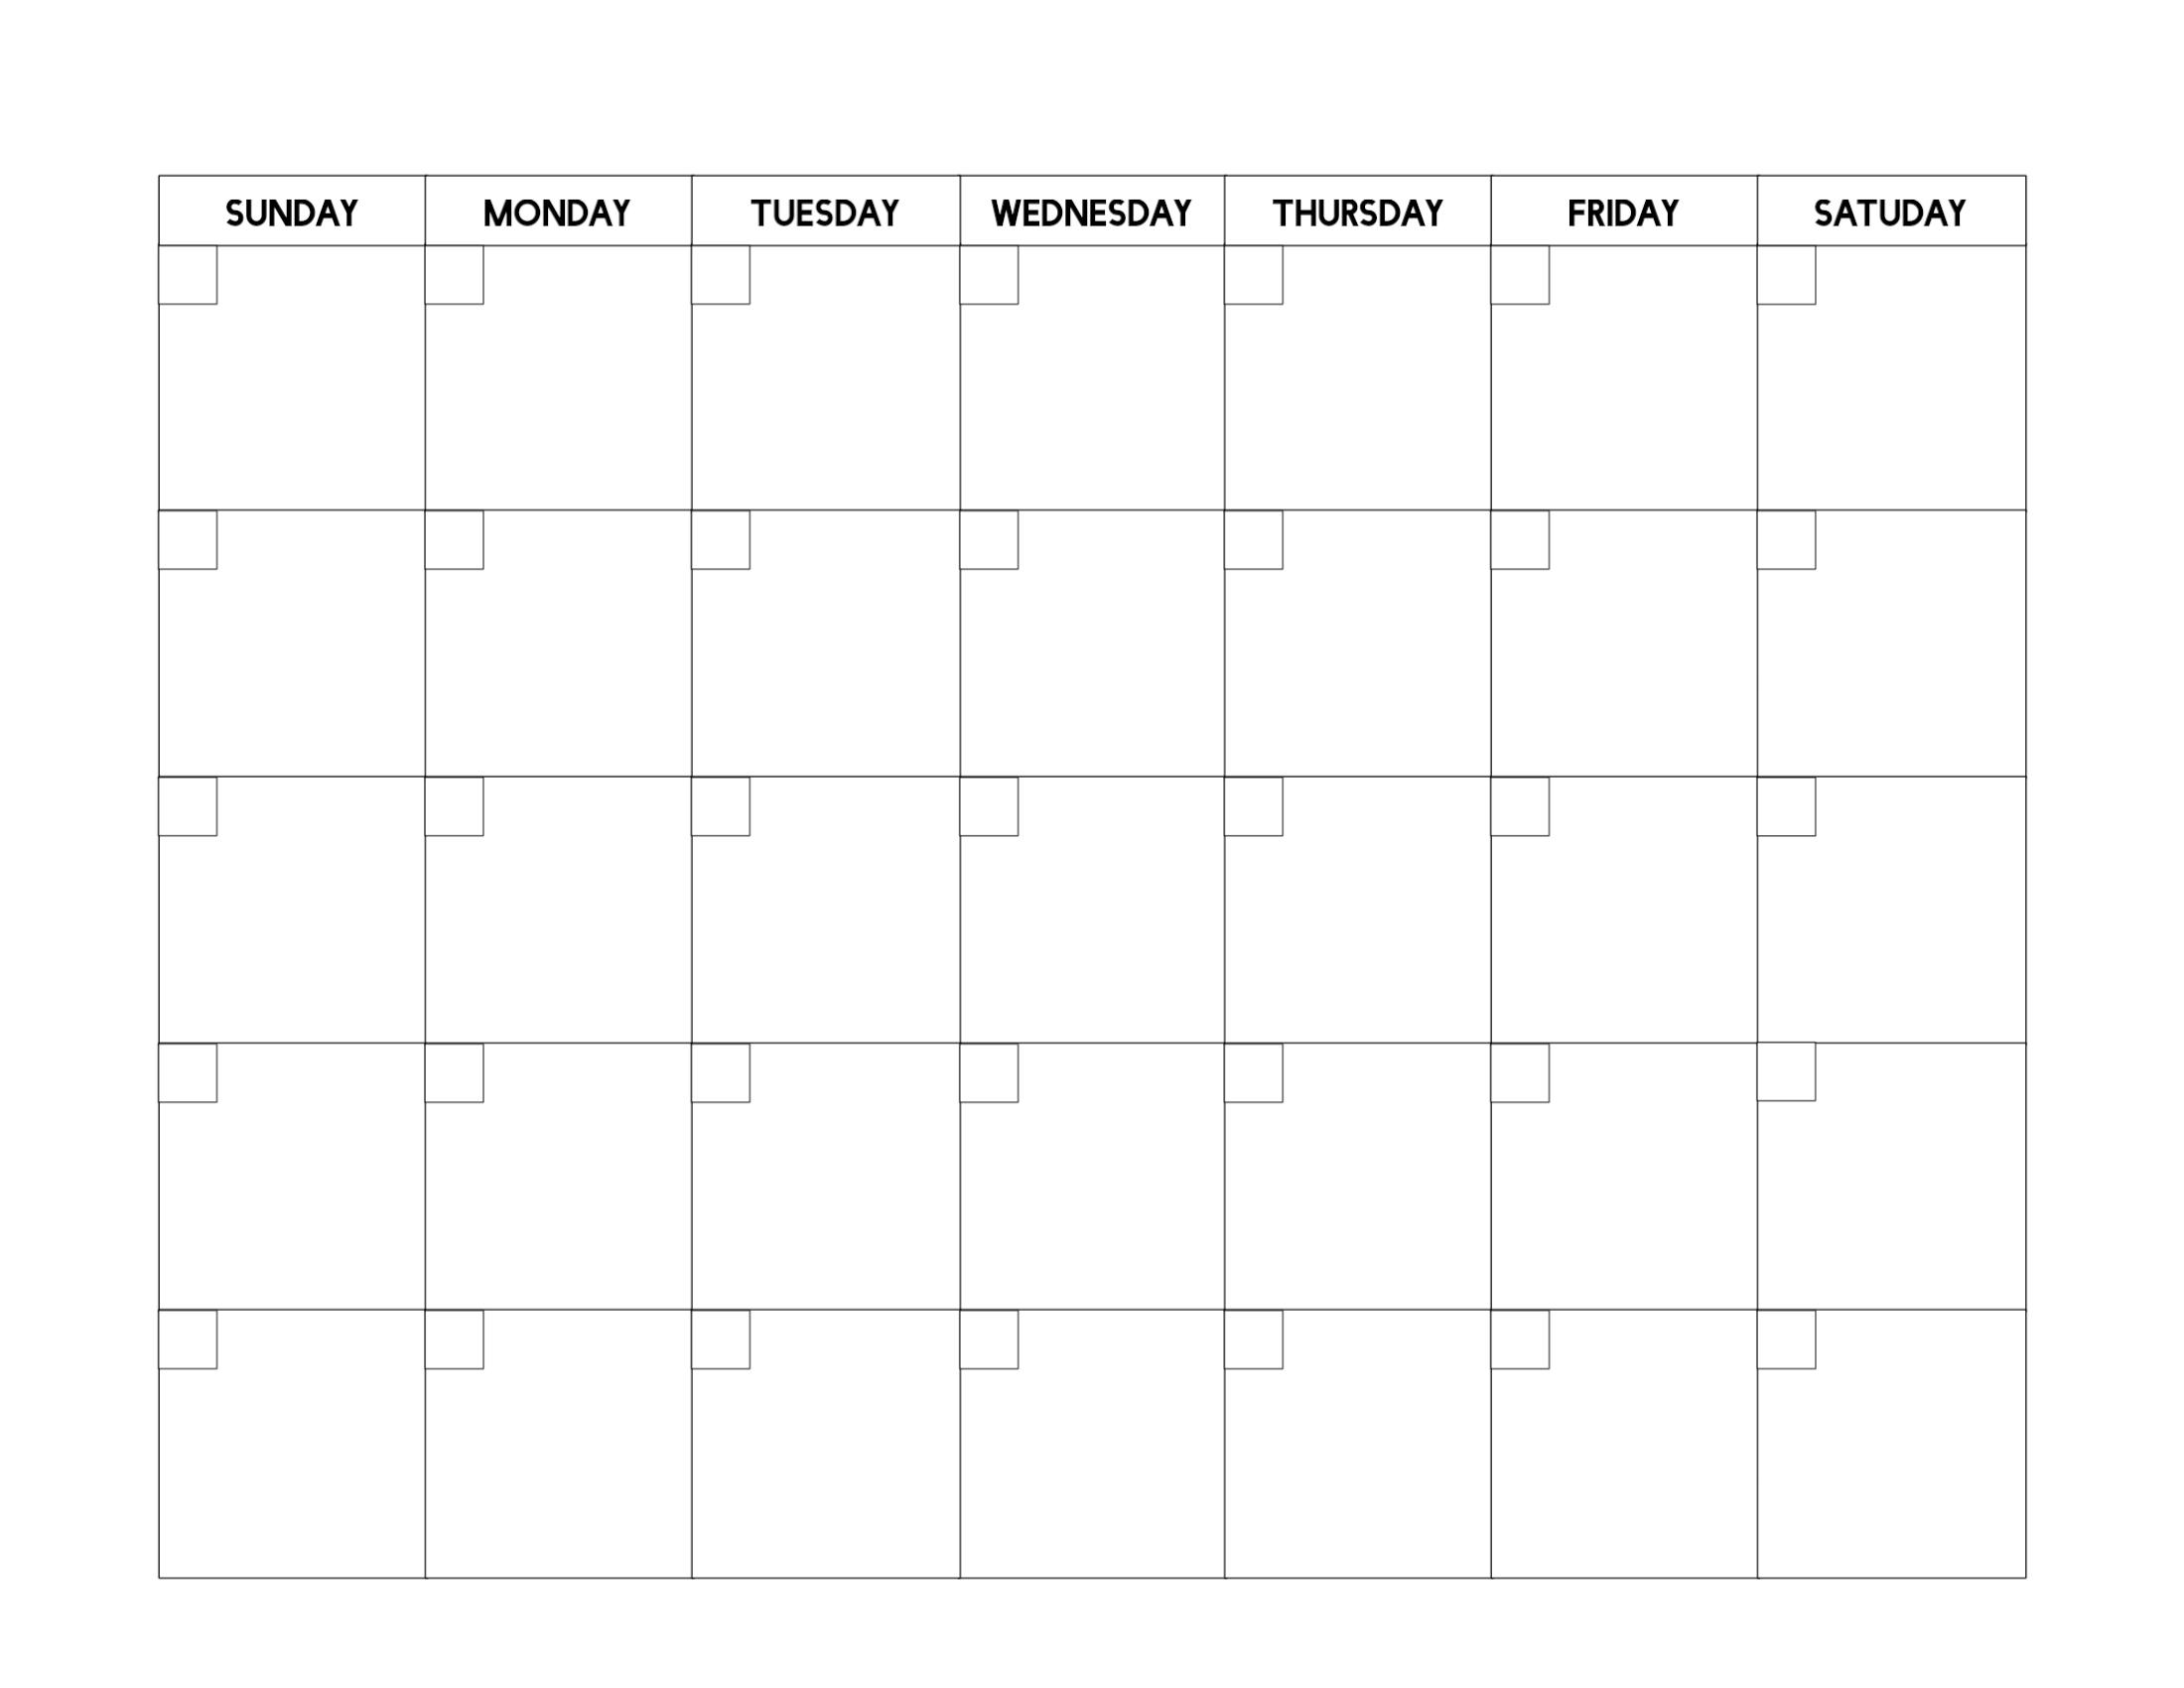 Free Printable Blank Calendar Template - Paper Trail Design_A Printable Blank Calendar